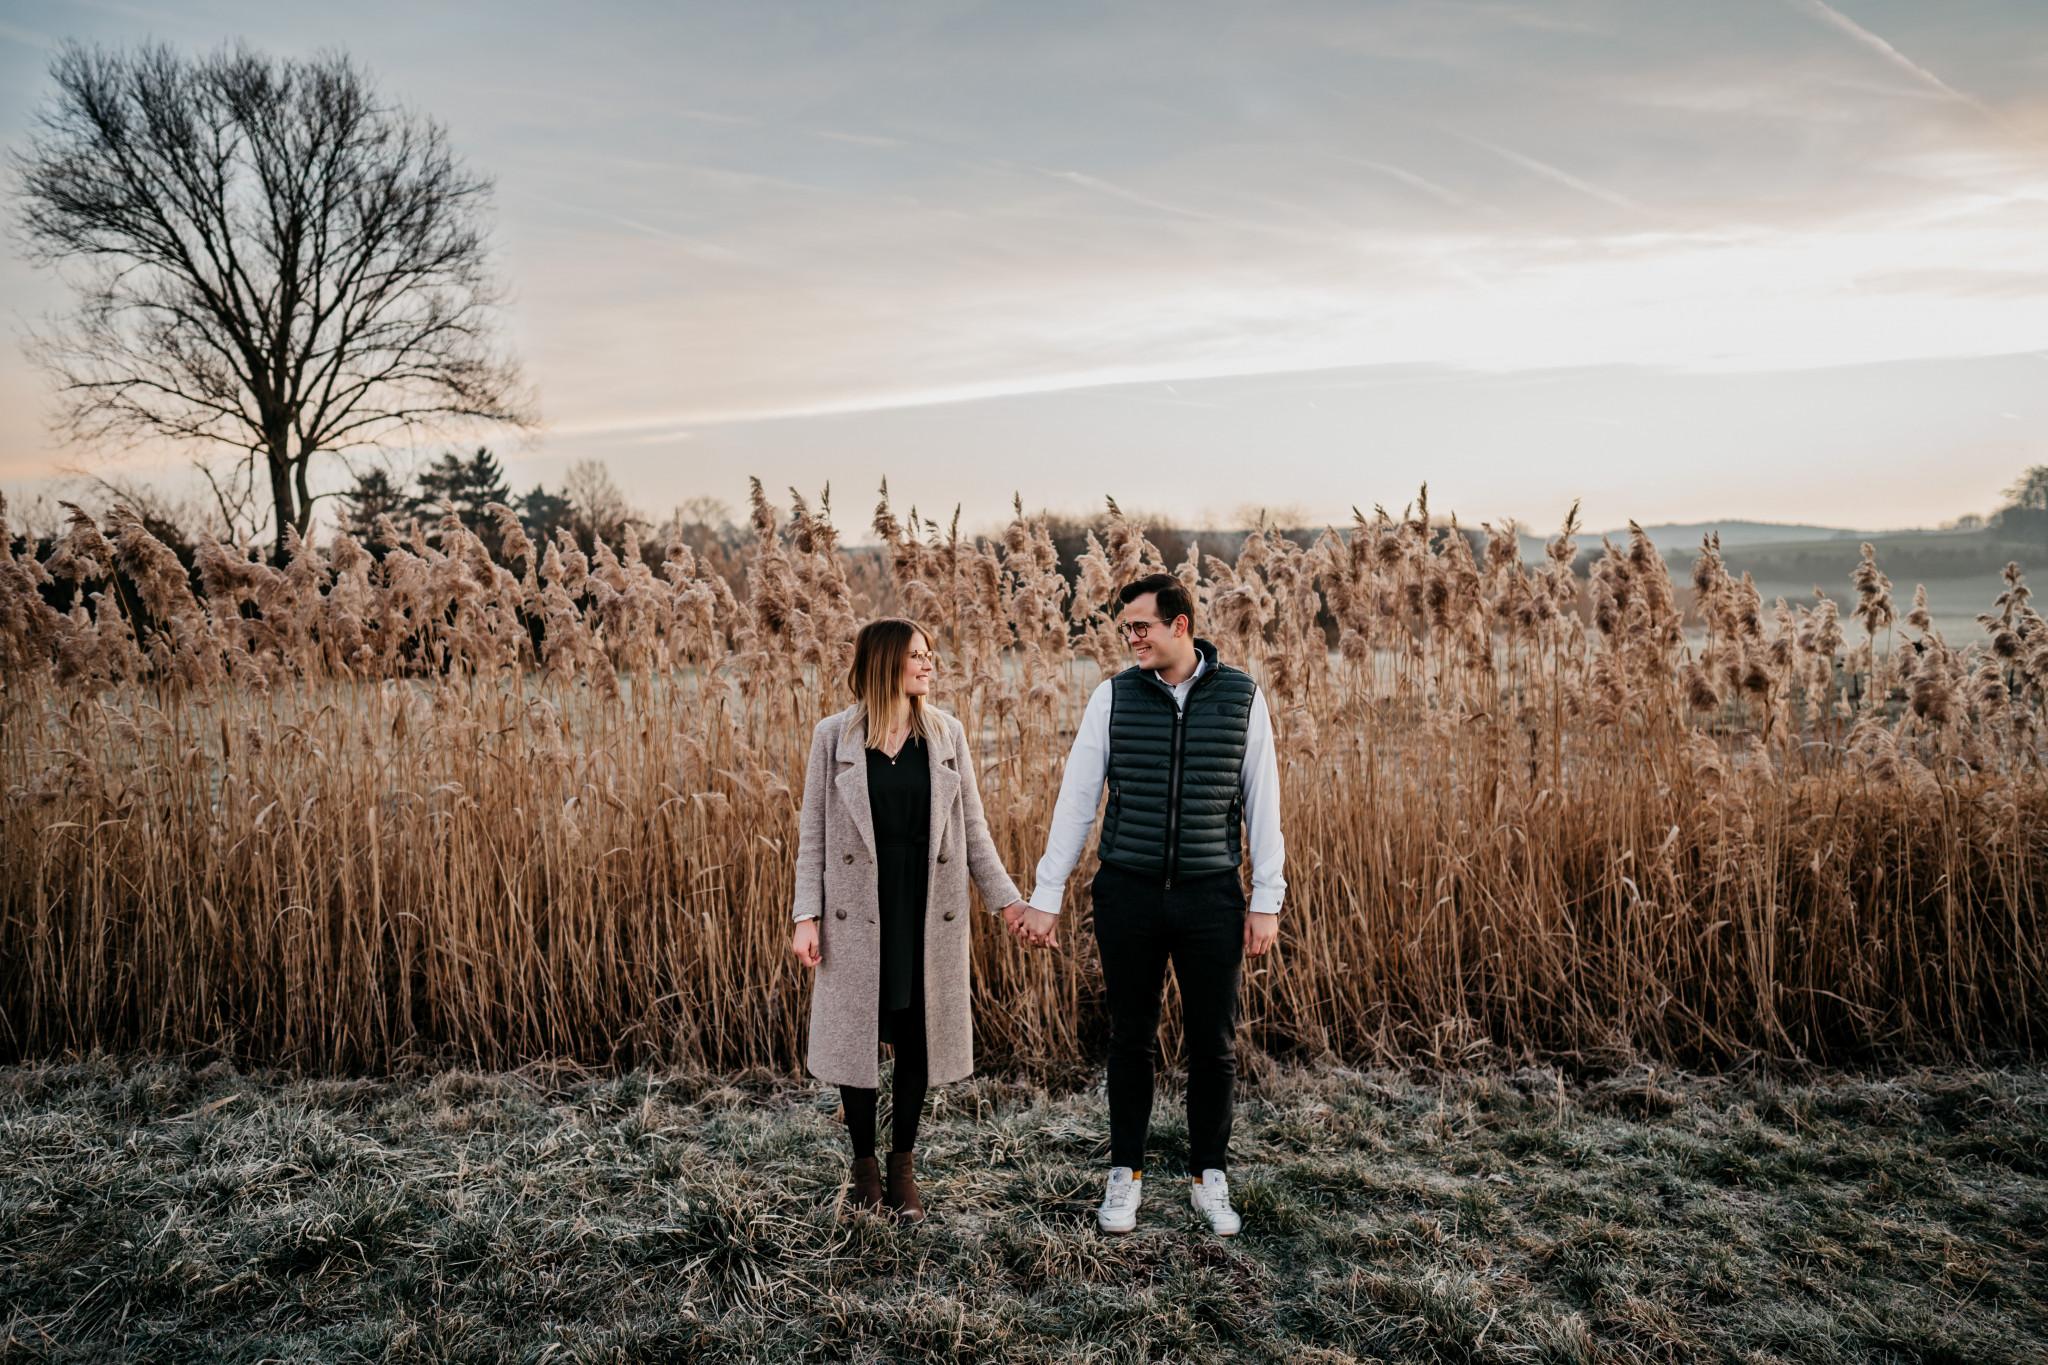 Verlobungsshooting bei Sonnenaufgang